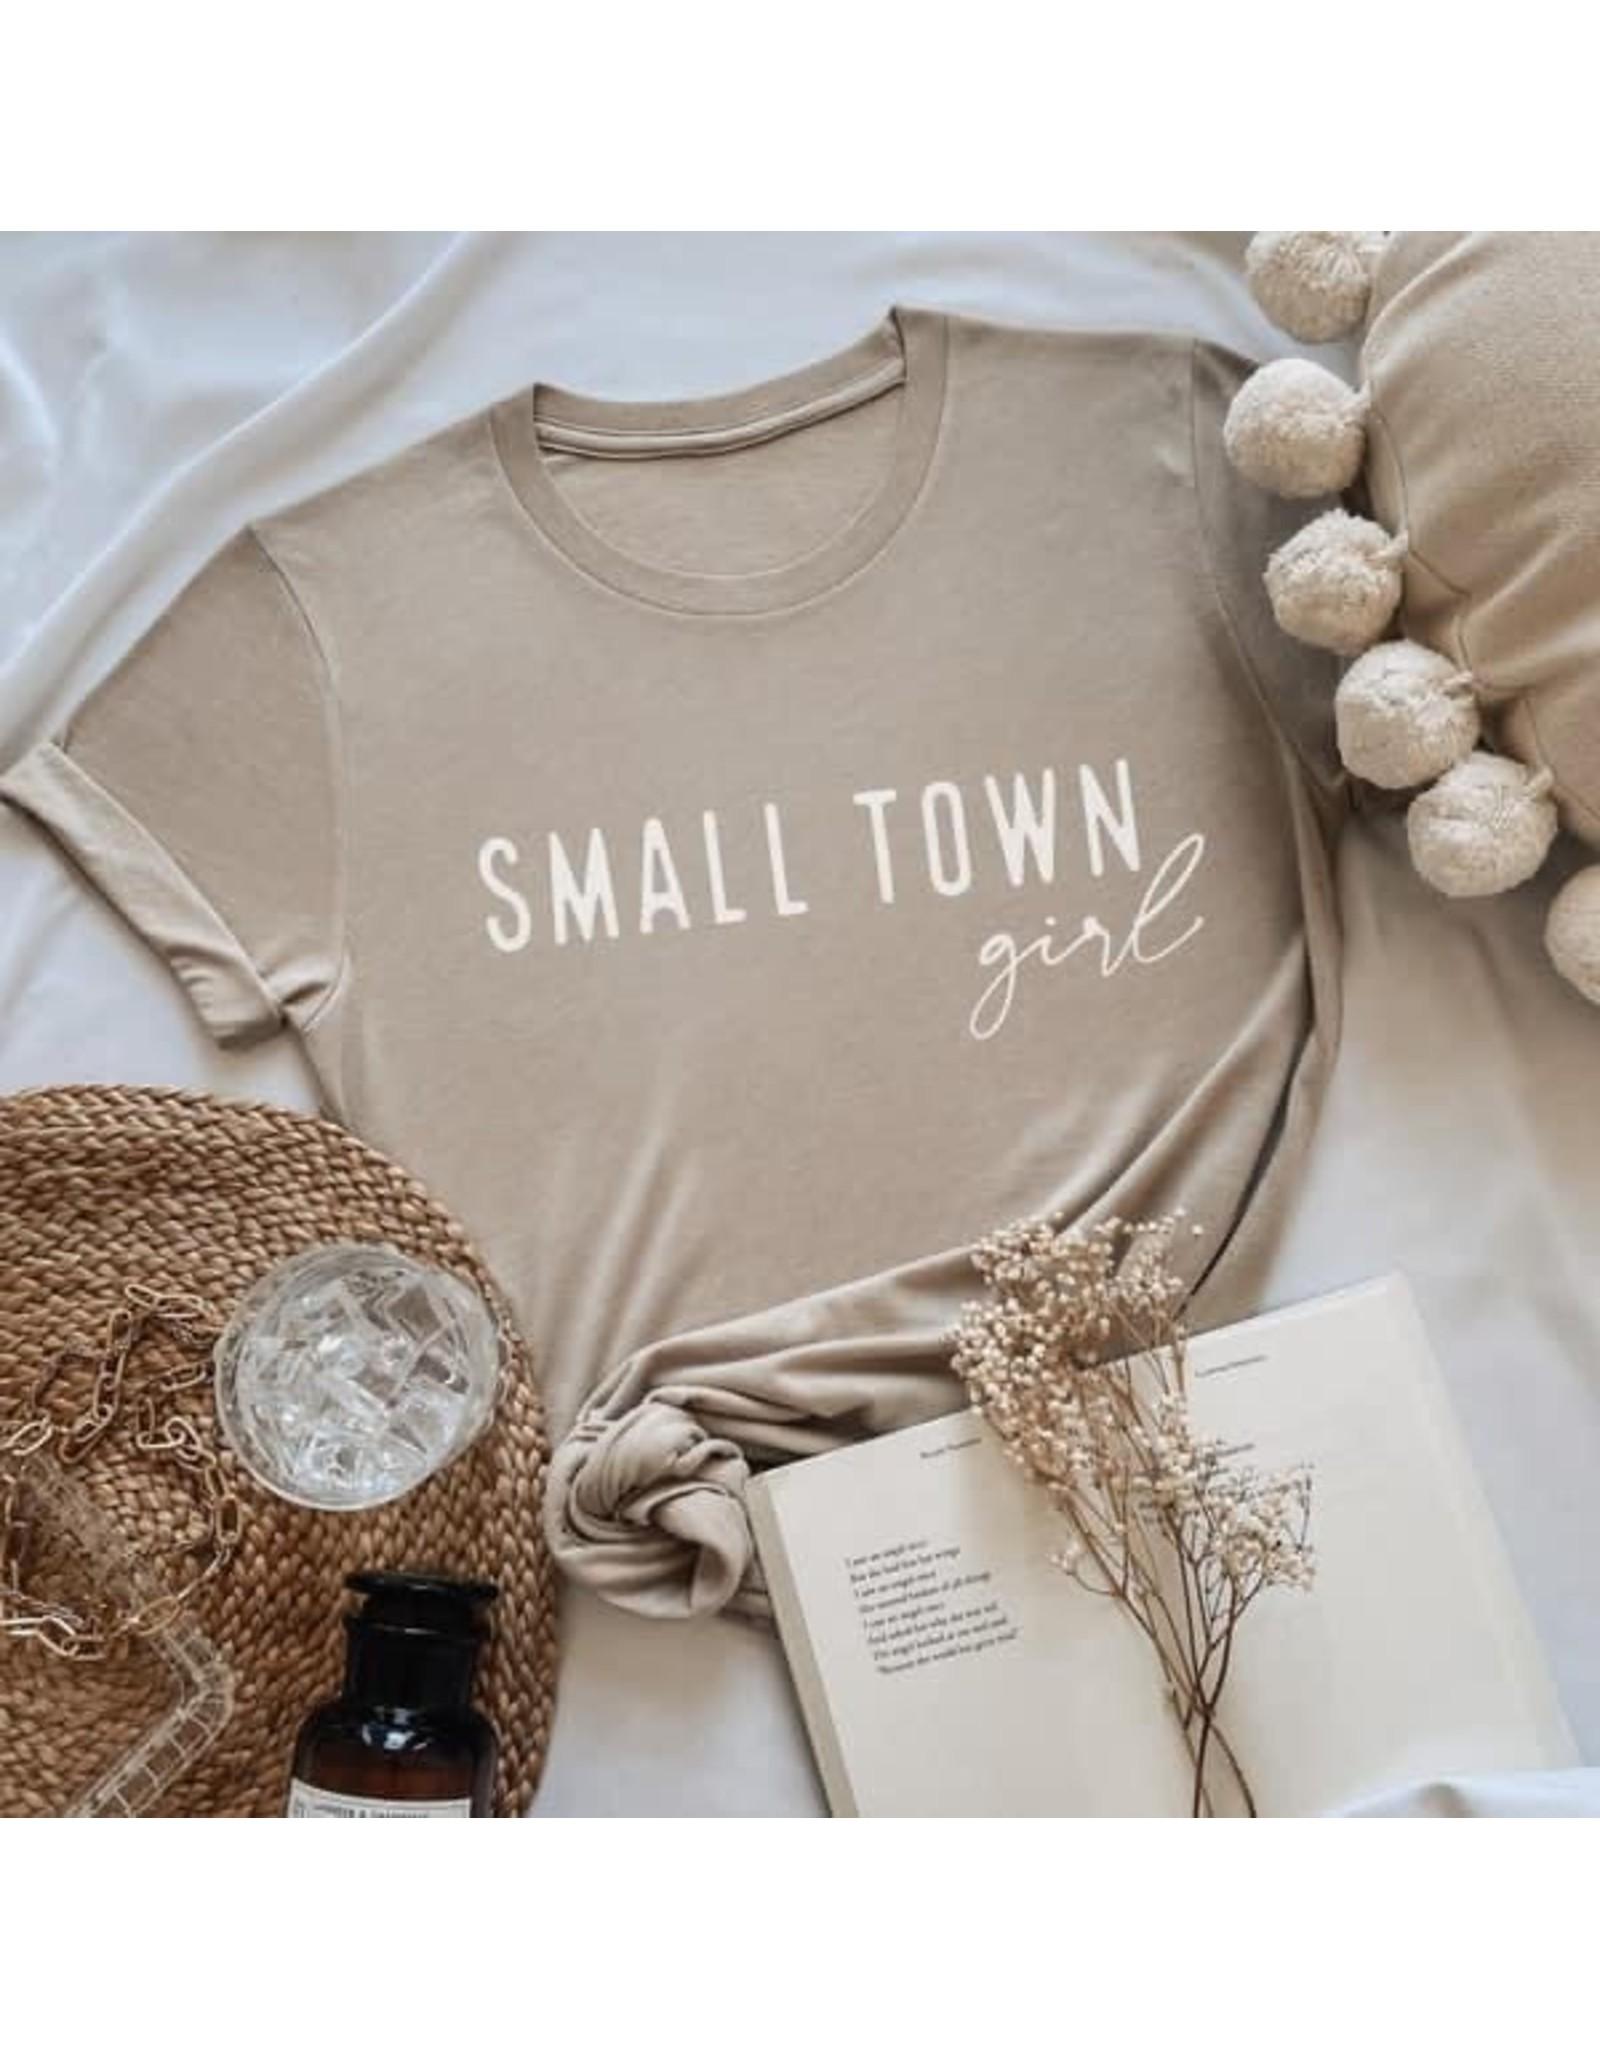 Small Town Girl Tee